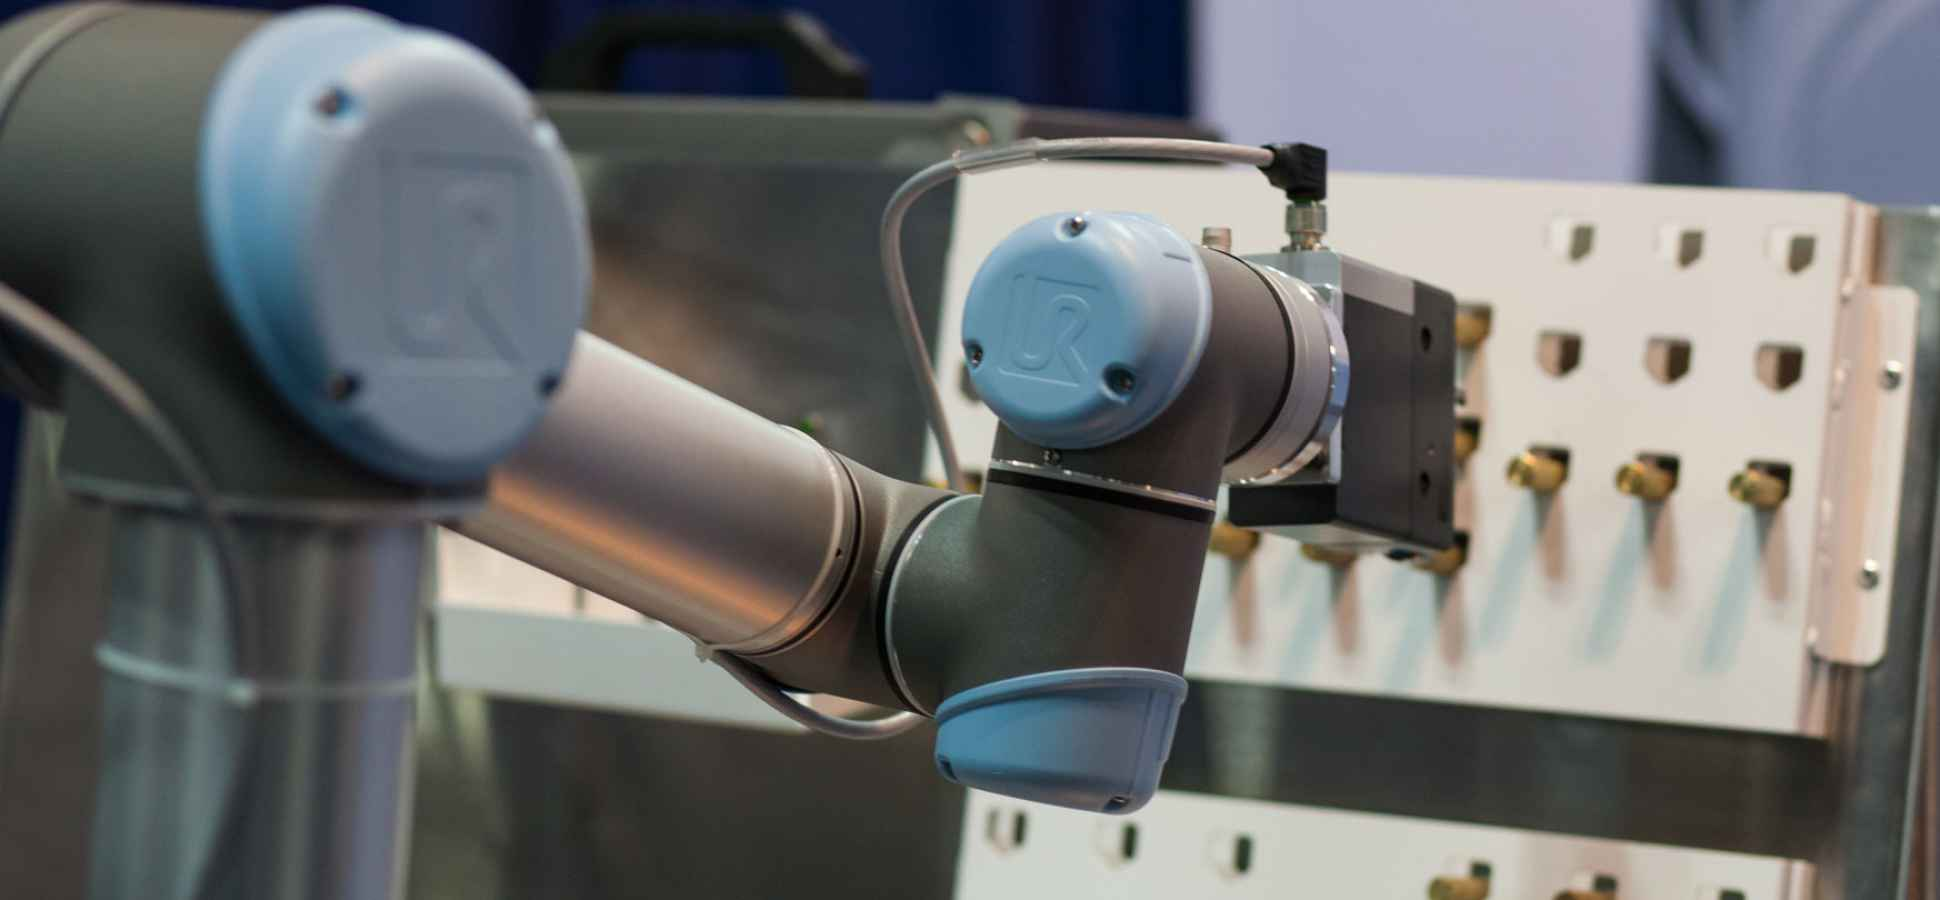 Robots Are the Future of Employment | Inc com